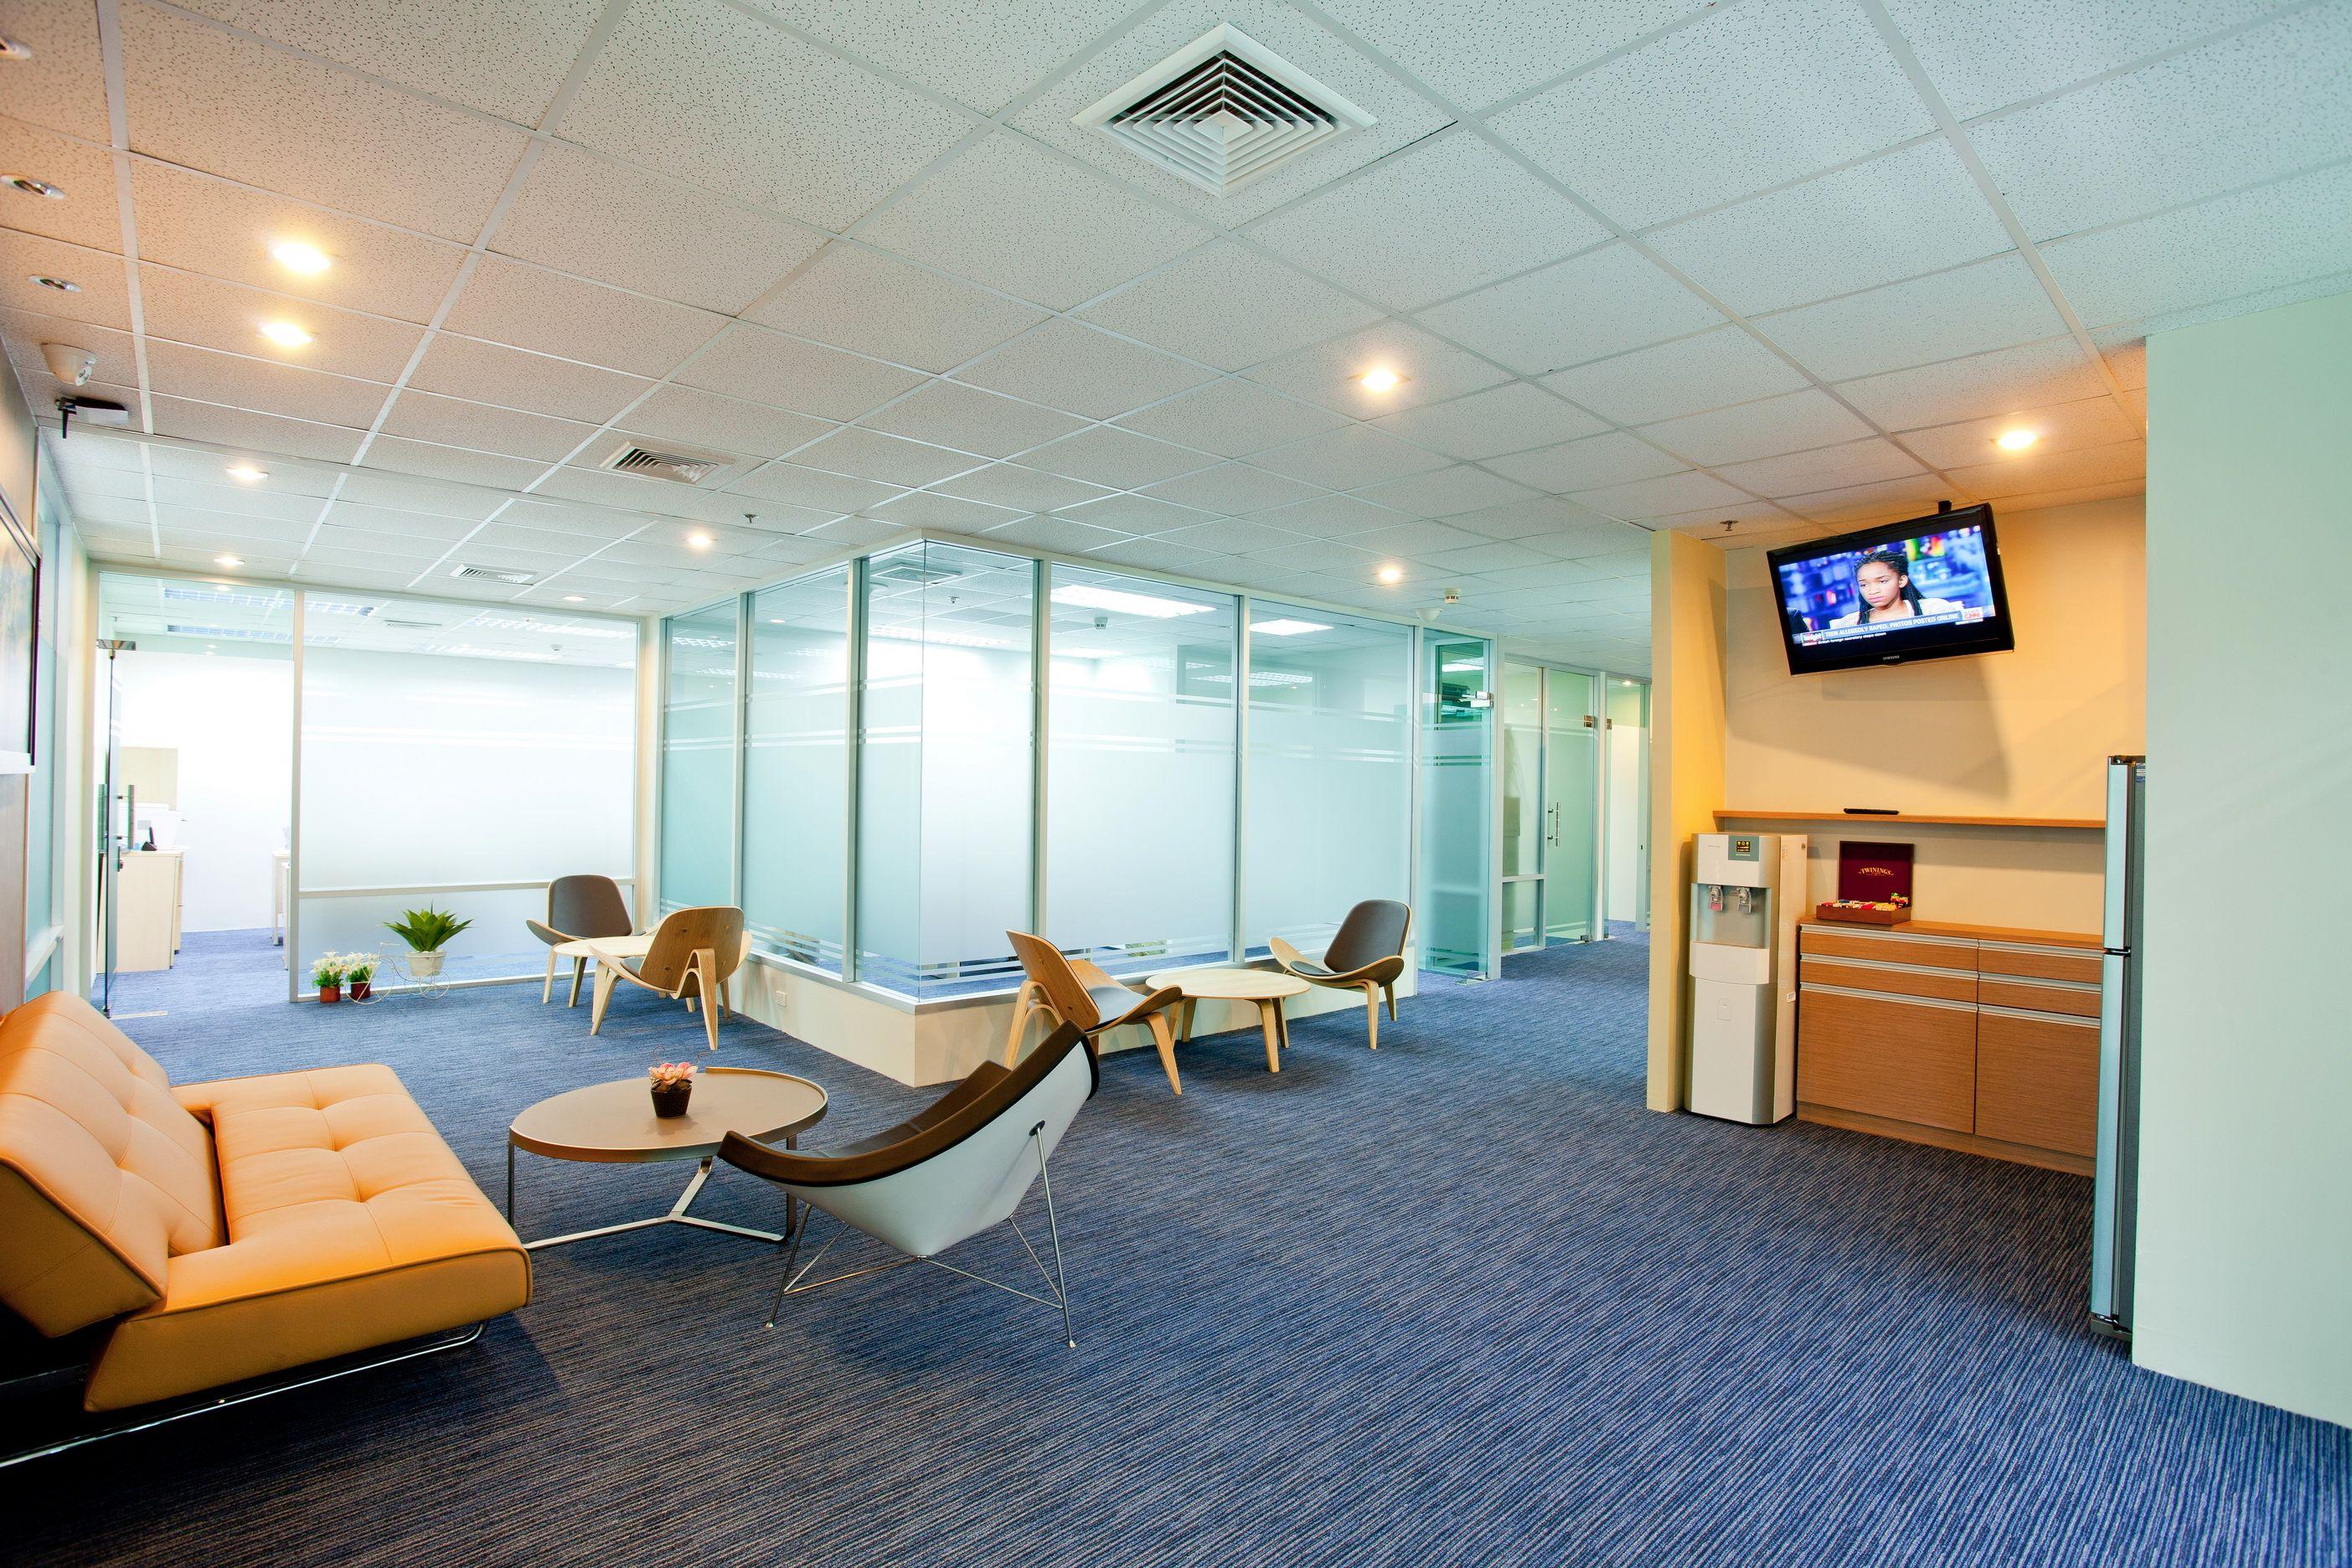 Linuxx Serviced Office Cozy Living Room President Tower 6th Floor Chidlom Bangkok Thailand